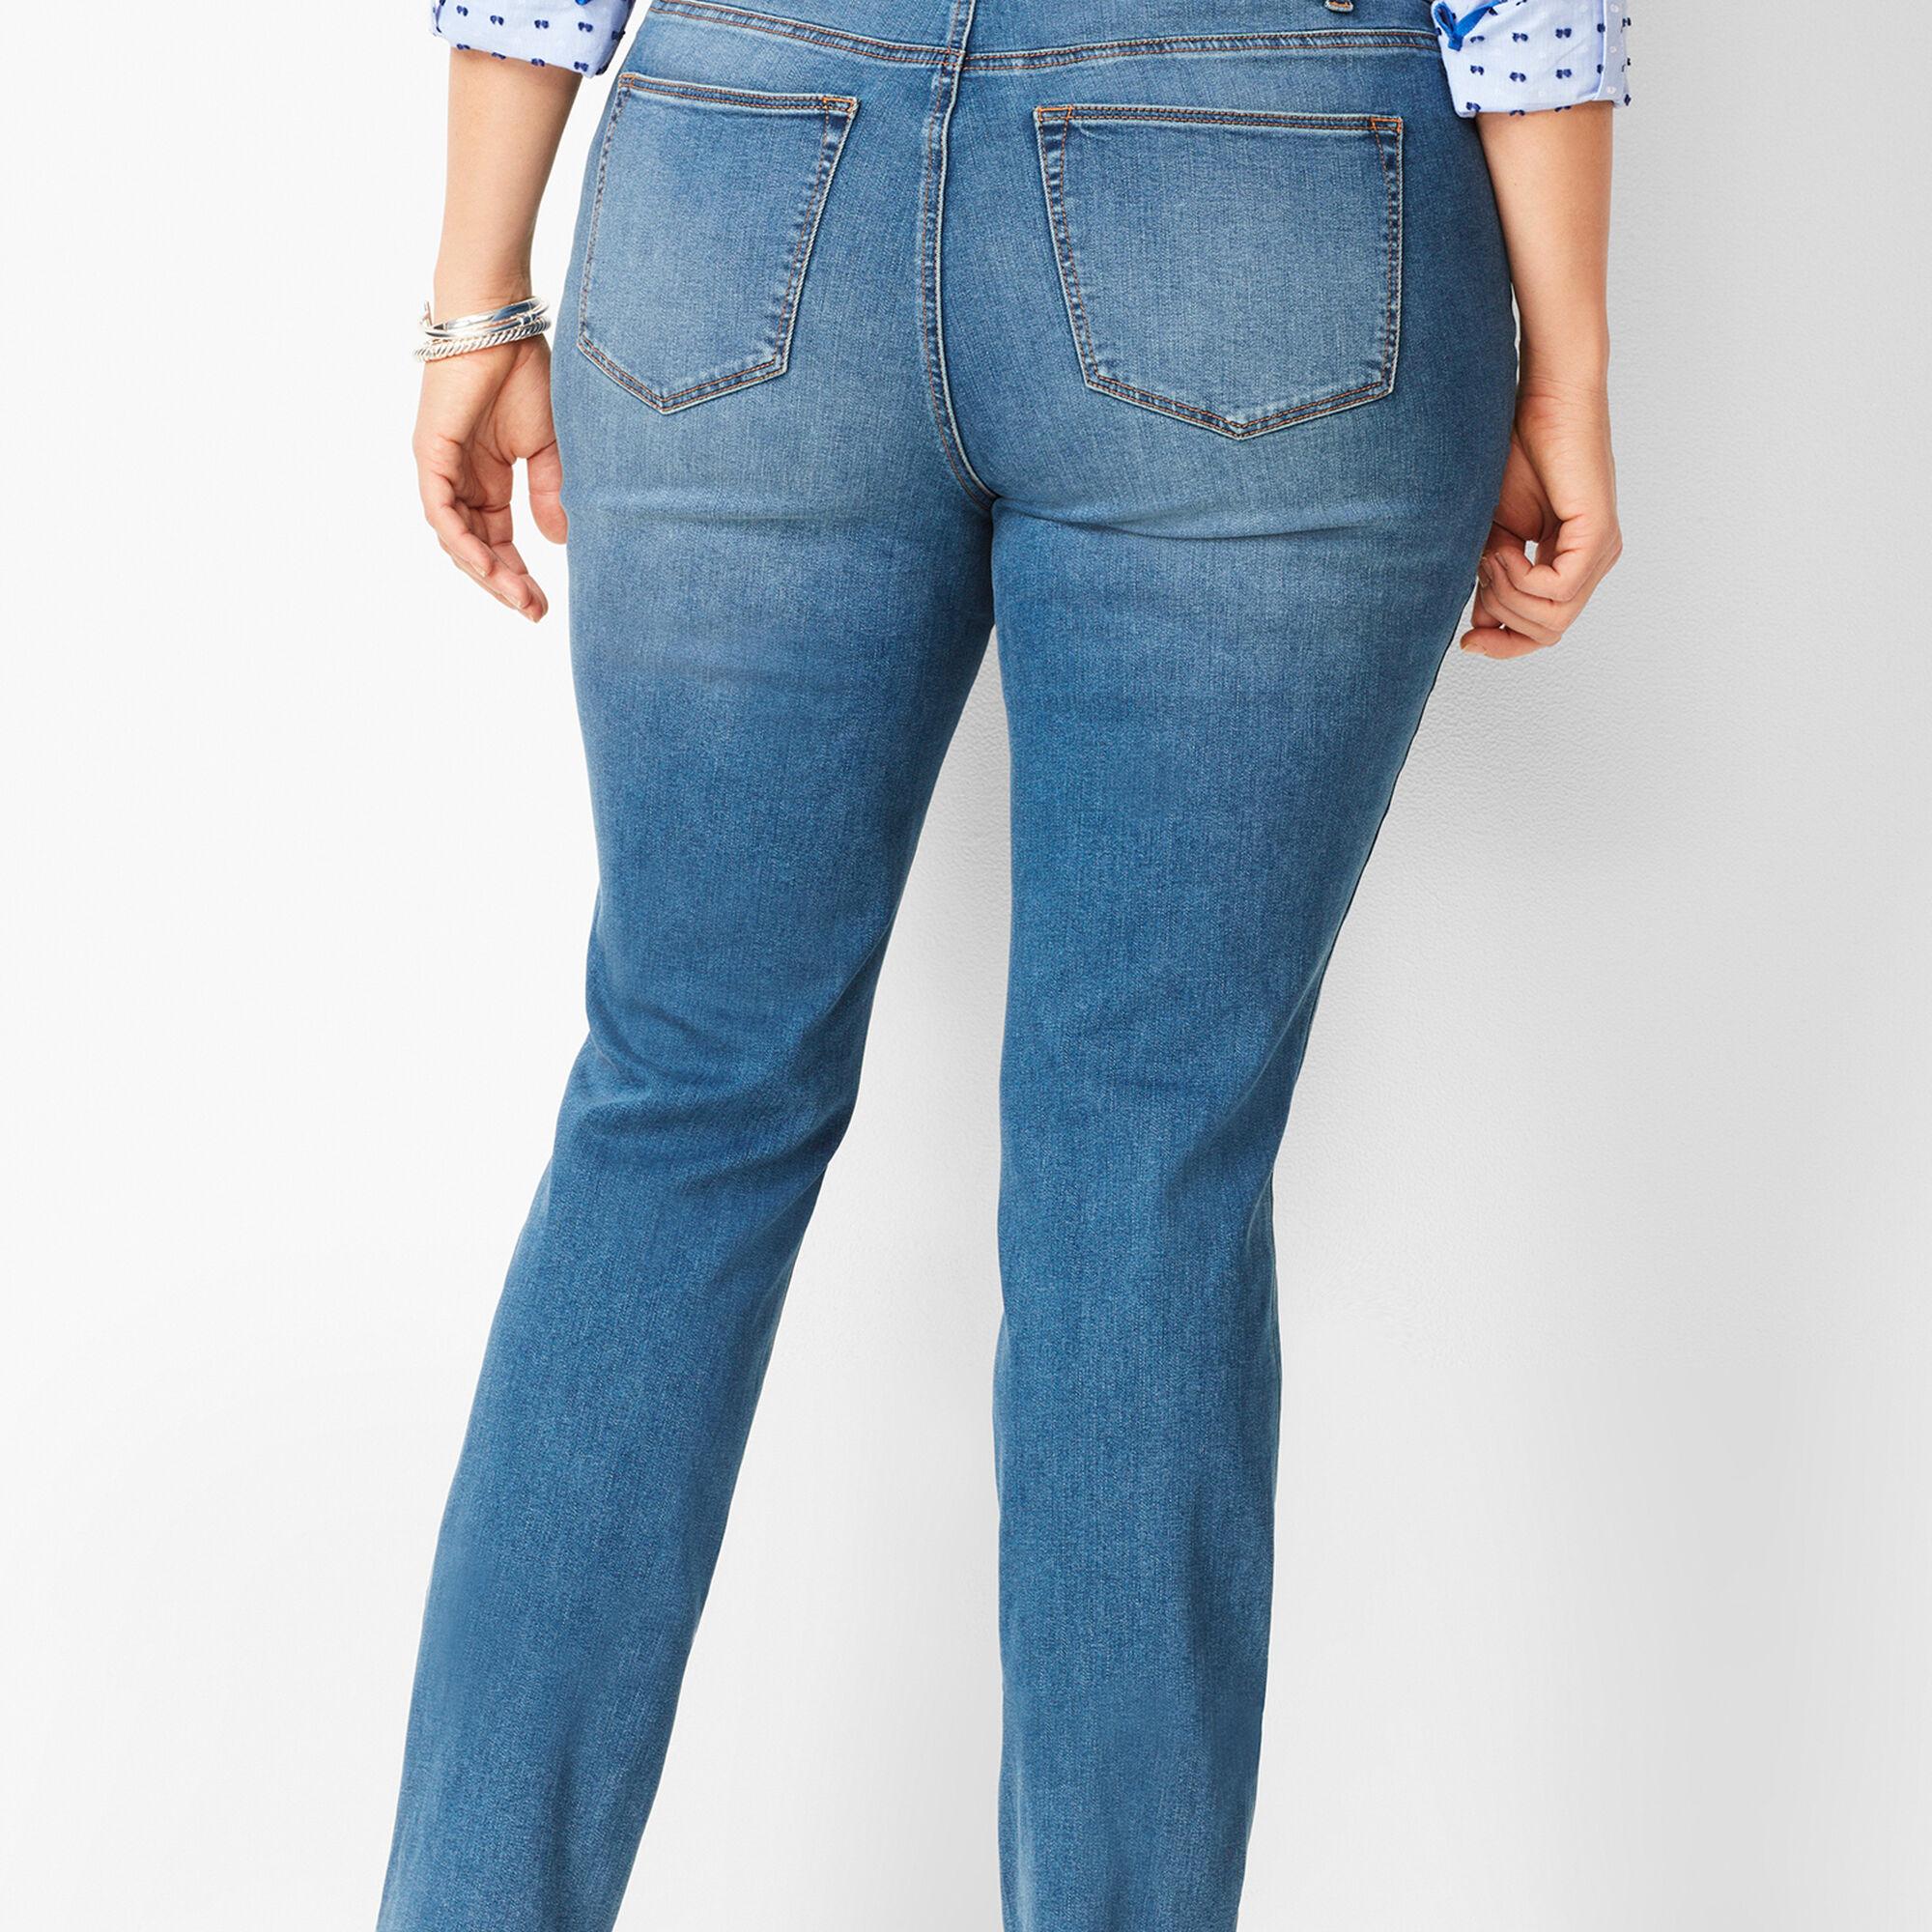 f095db7bb6cb3 High-Waist Straight-Leg Jeans - Aurora Wash